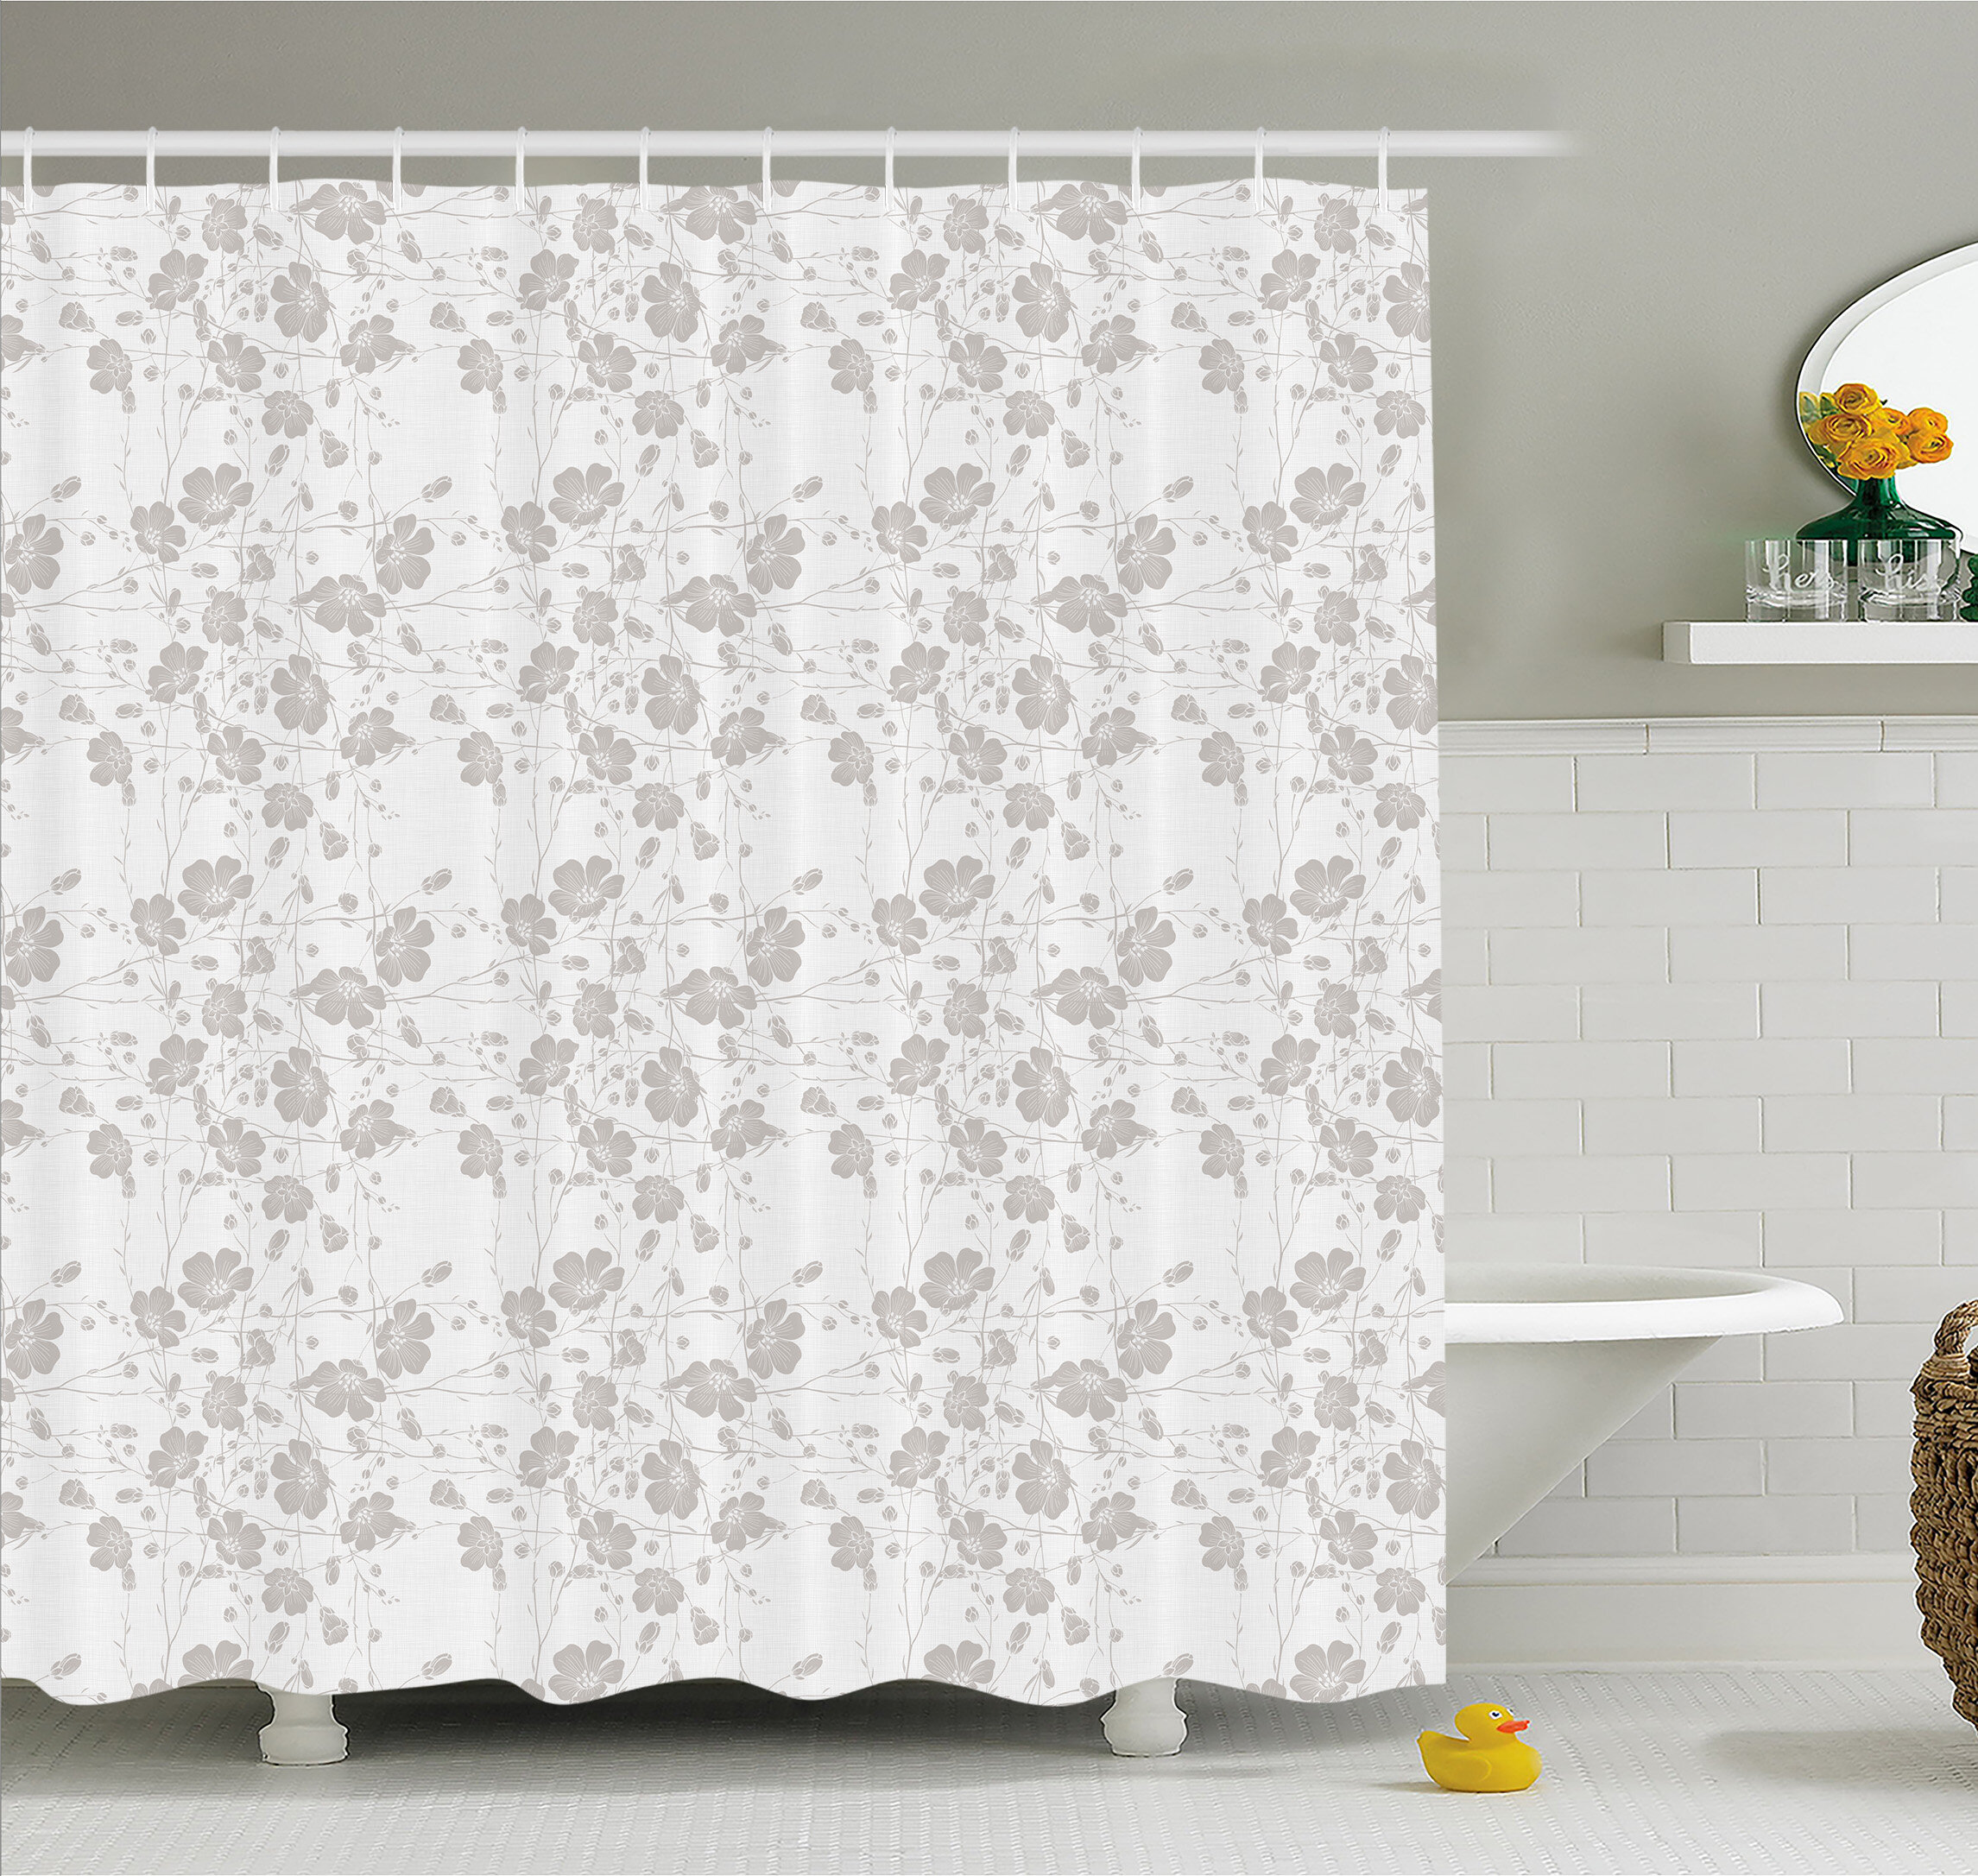 Natural Beauty Flower Hand Drawn Peonies Bouquet Florets Romantic Feminine Home Decor Shower Curtain Set